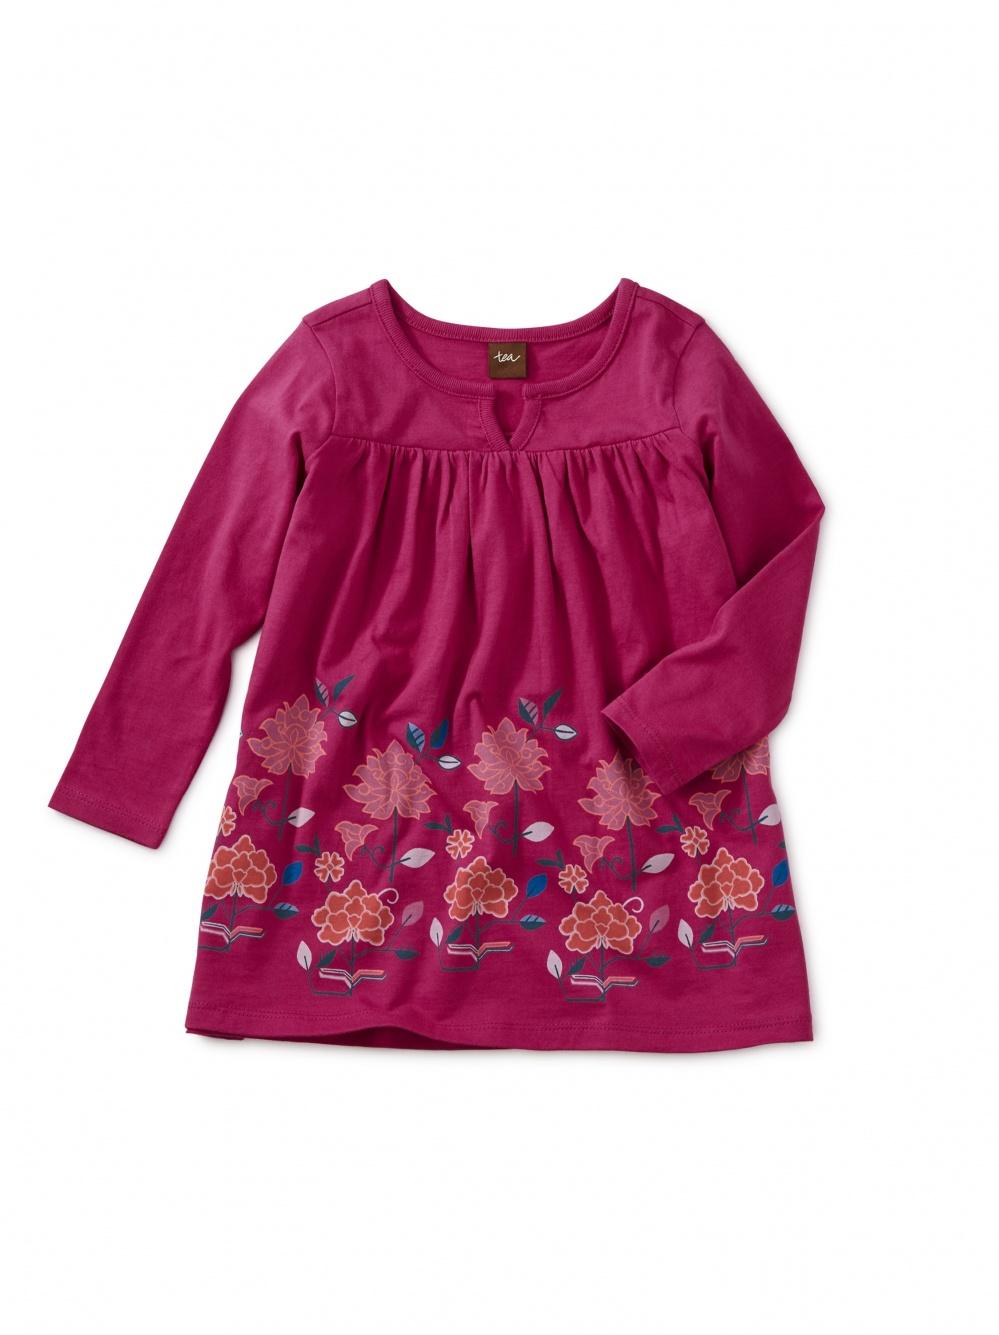 Water Lotus Graphic Baby Dress